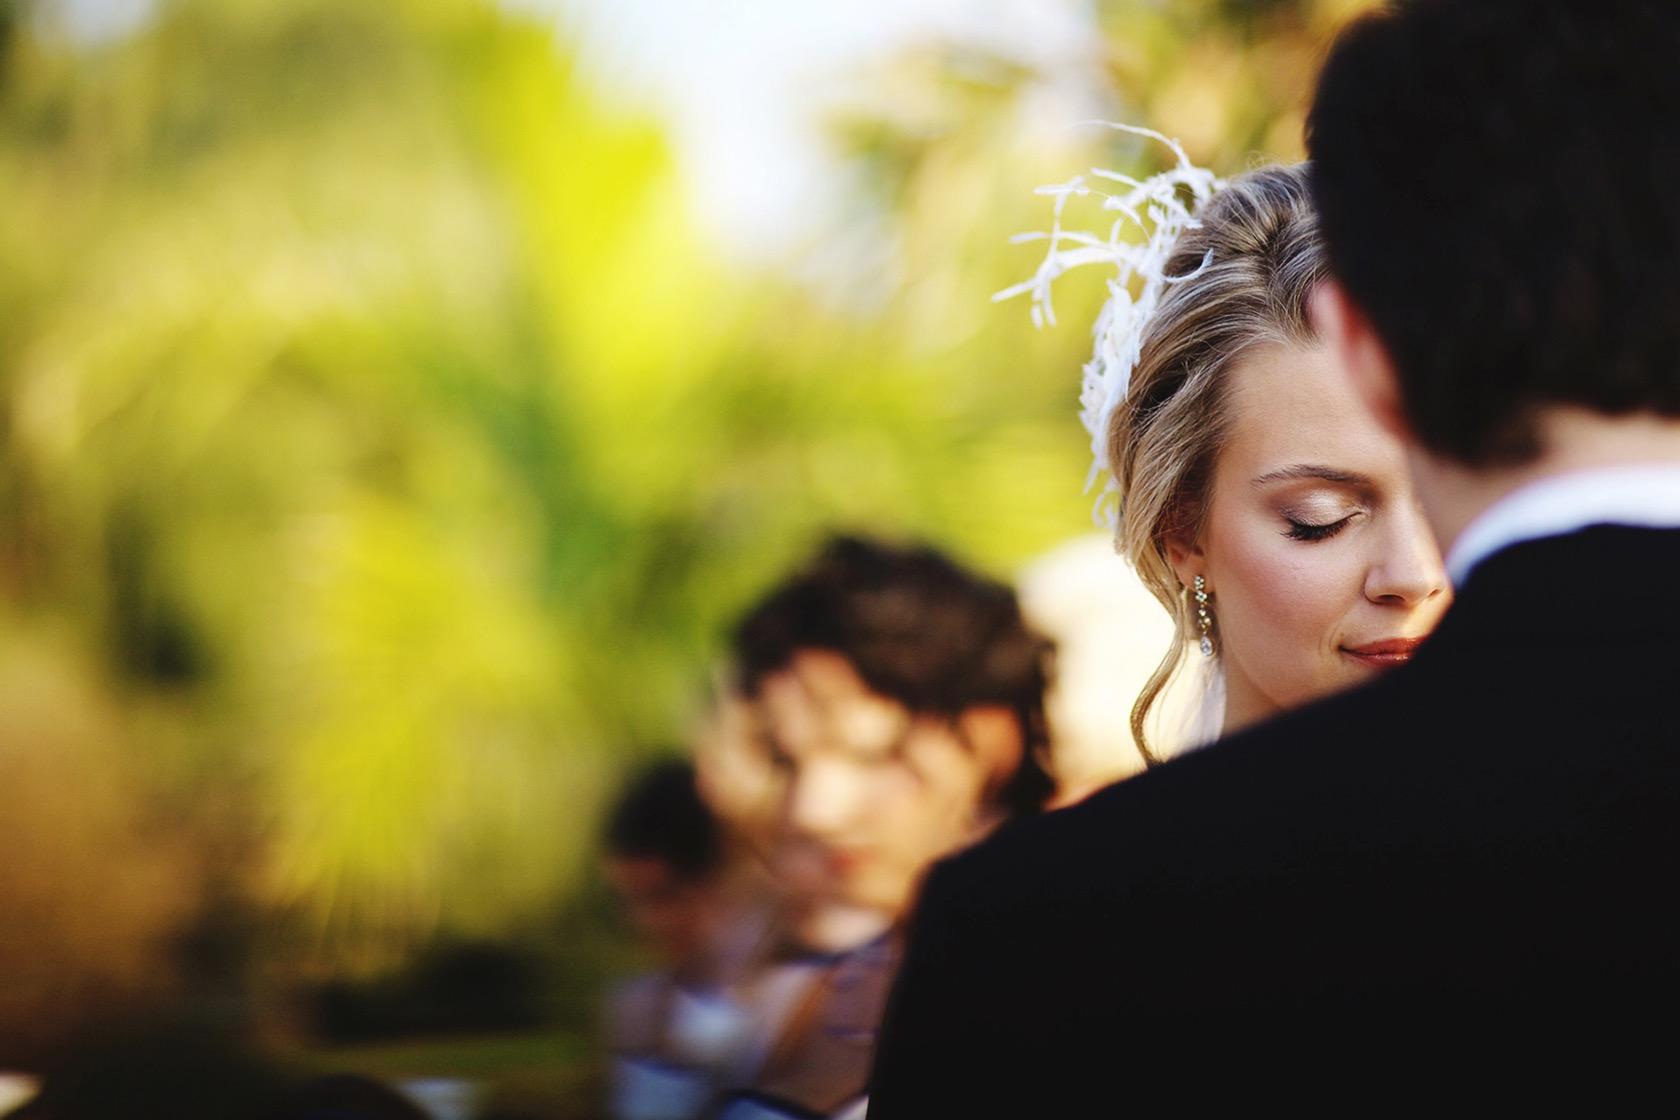 stephen sager photography 2146 toronto wedding photography